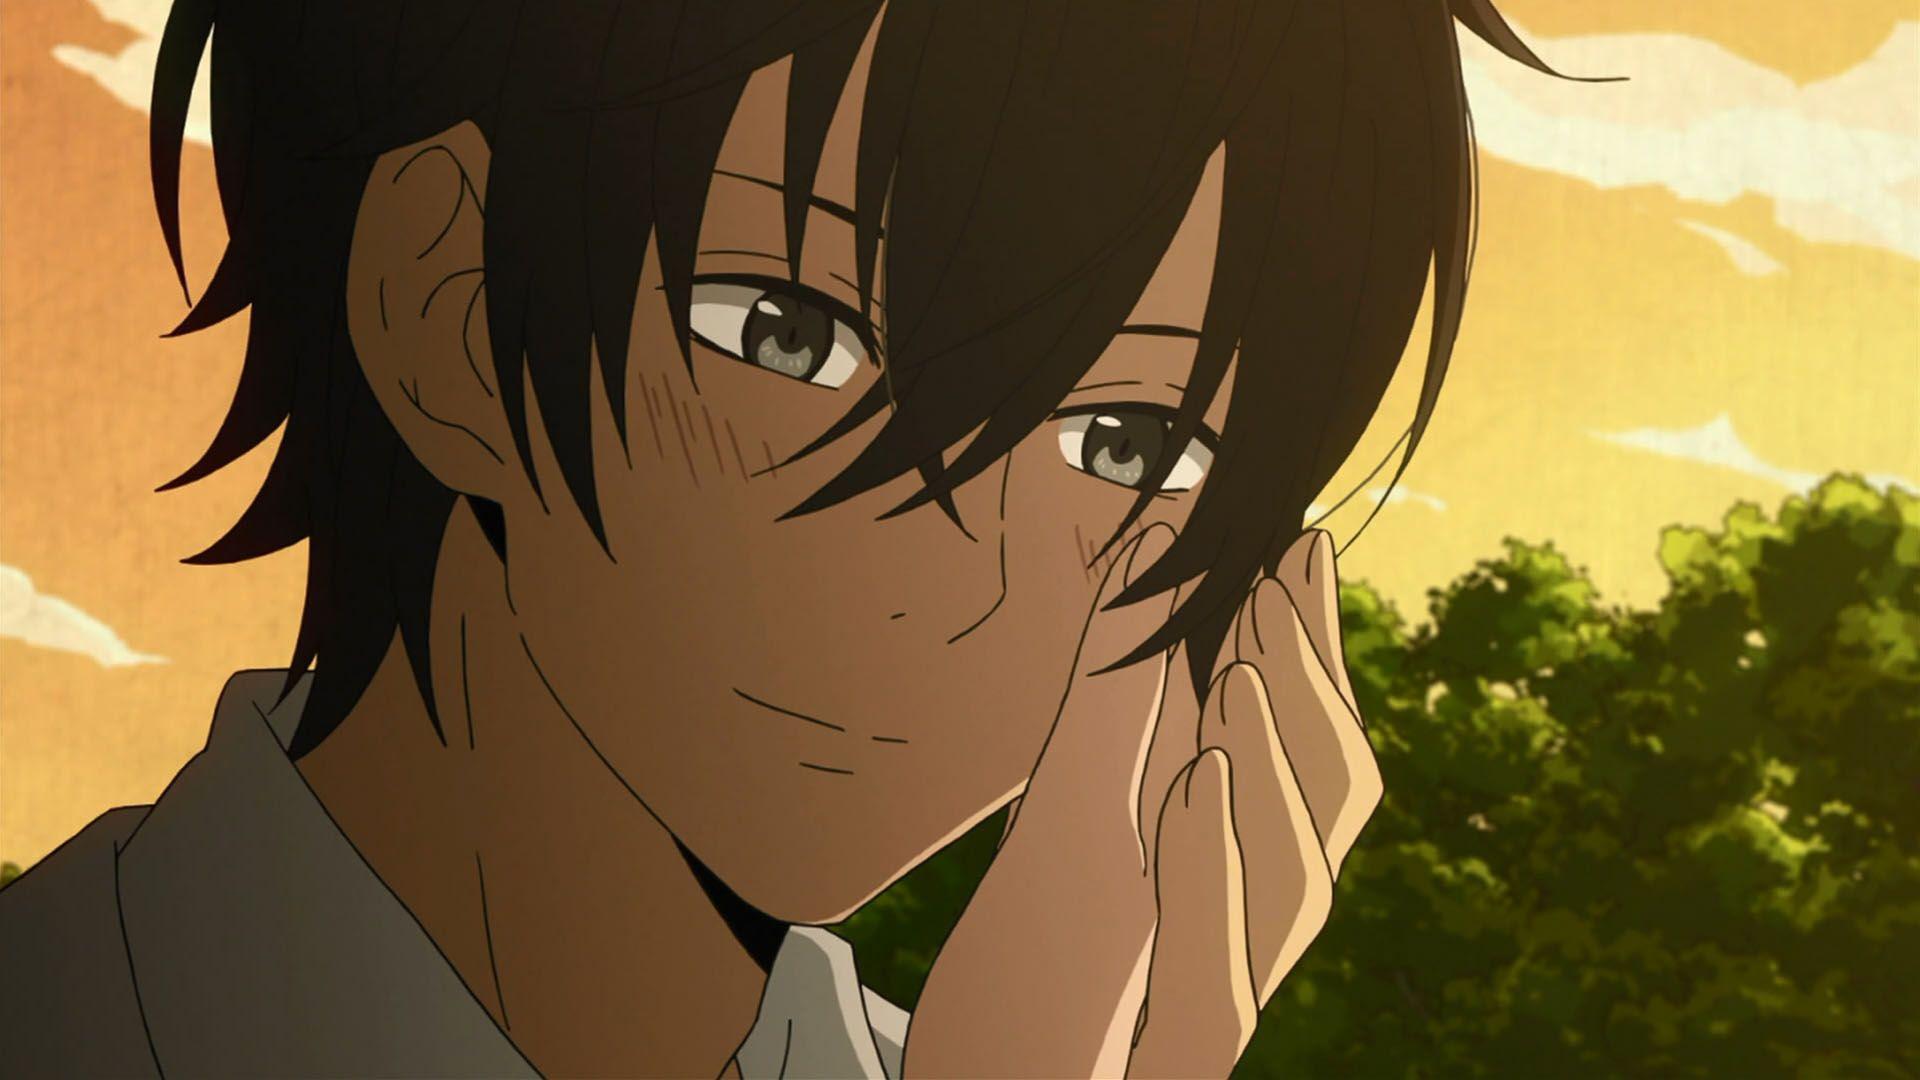 Shizuku x Haru Anime Anime, My little monster, Little